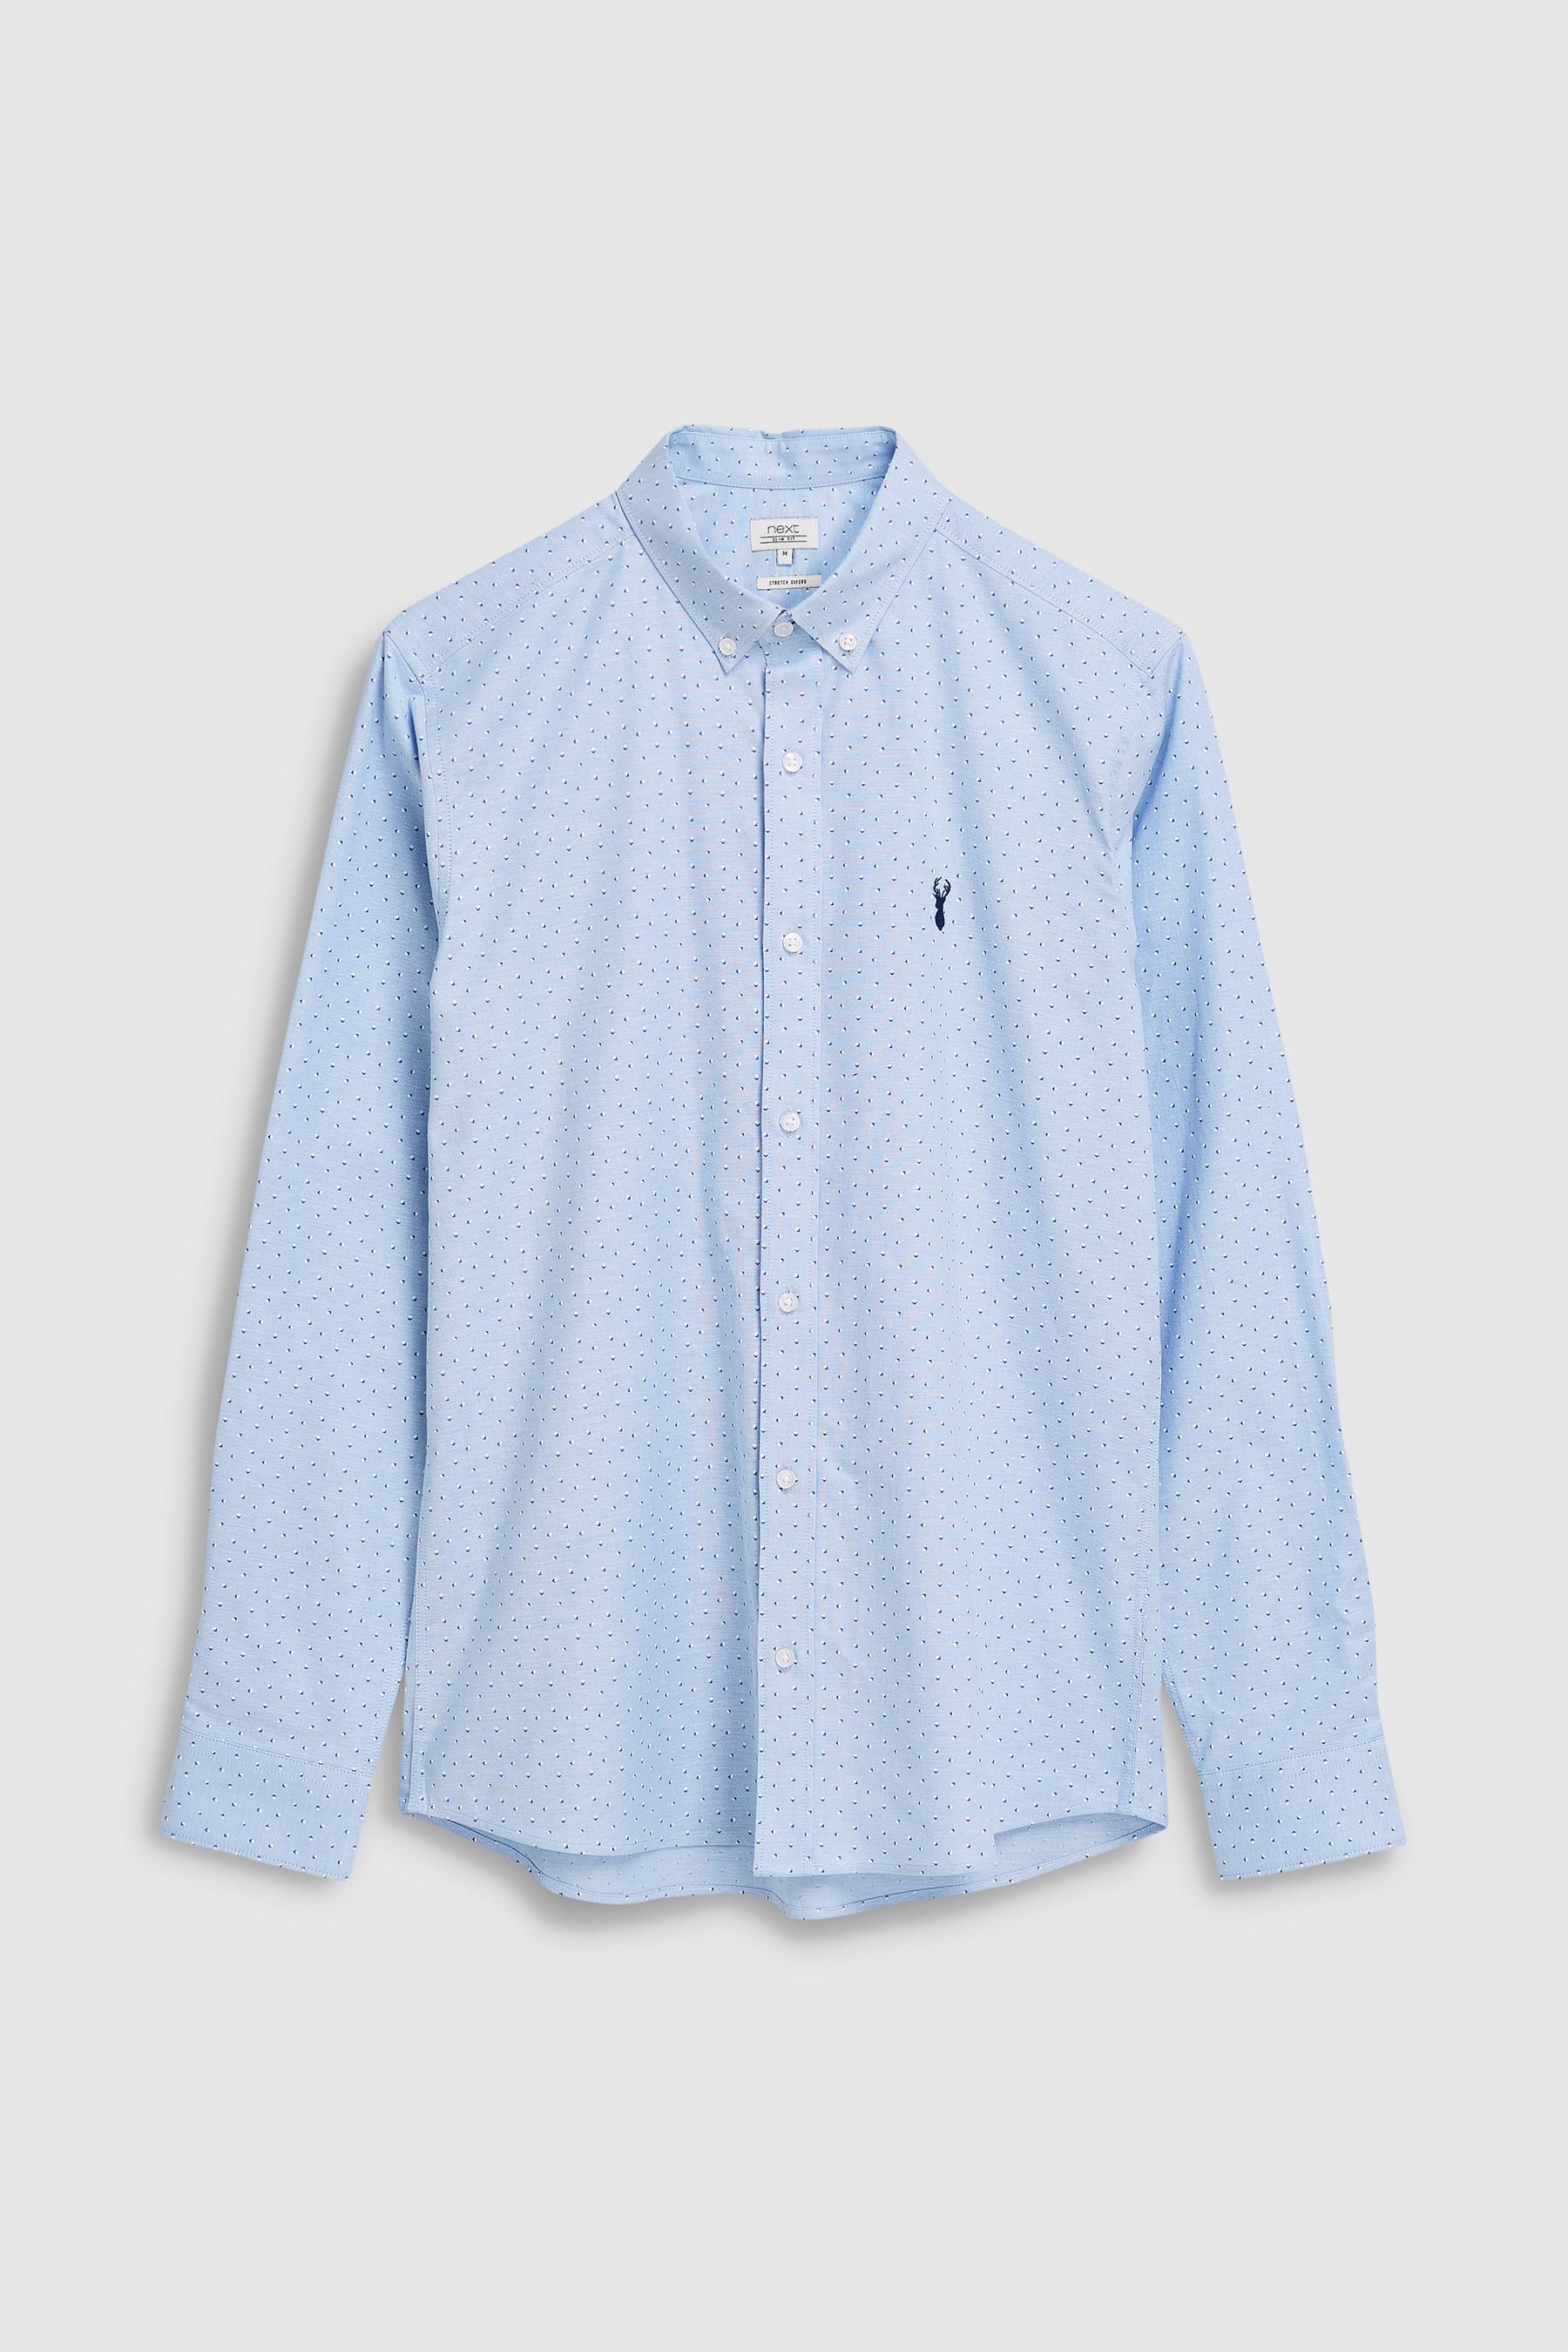 726c18f93 Mens Next Light Blue Print Slim Fit Long Sleeve Stretch Oxford Shirt - Pink